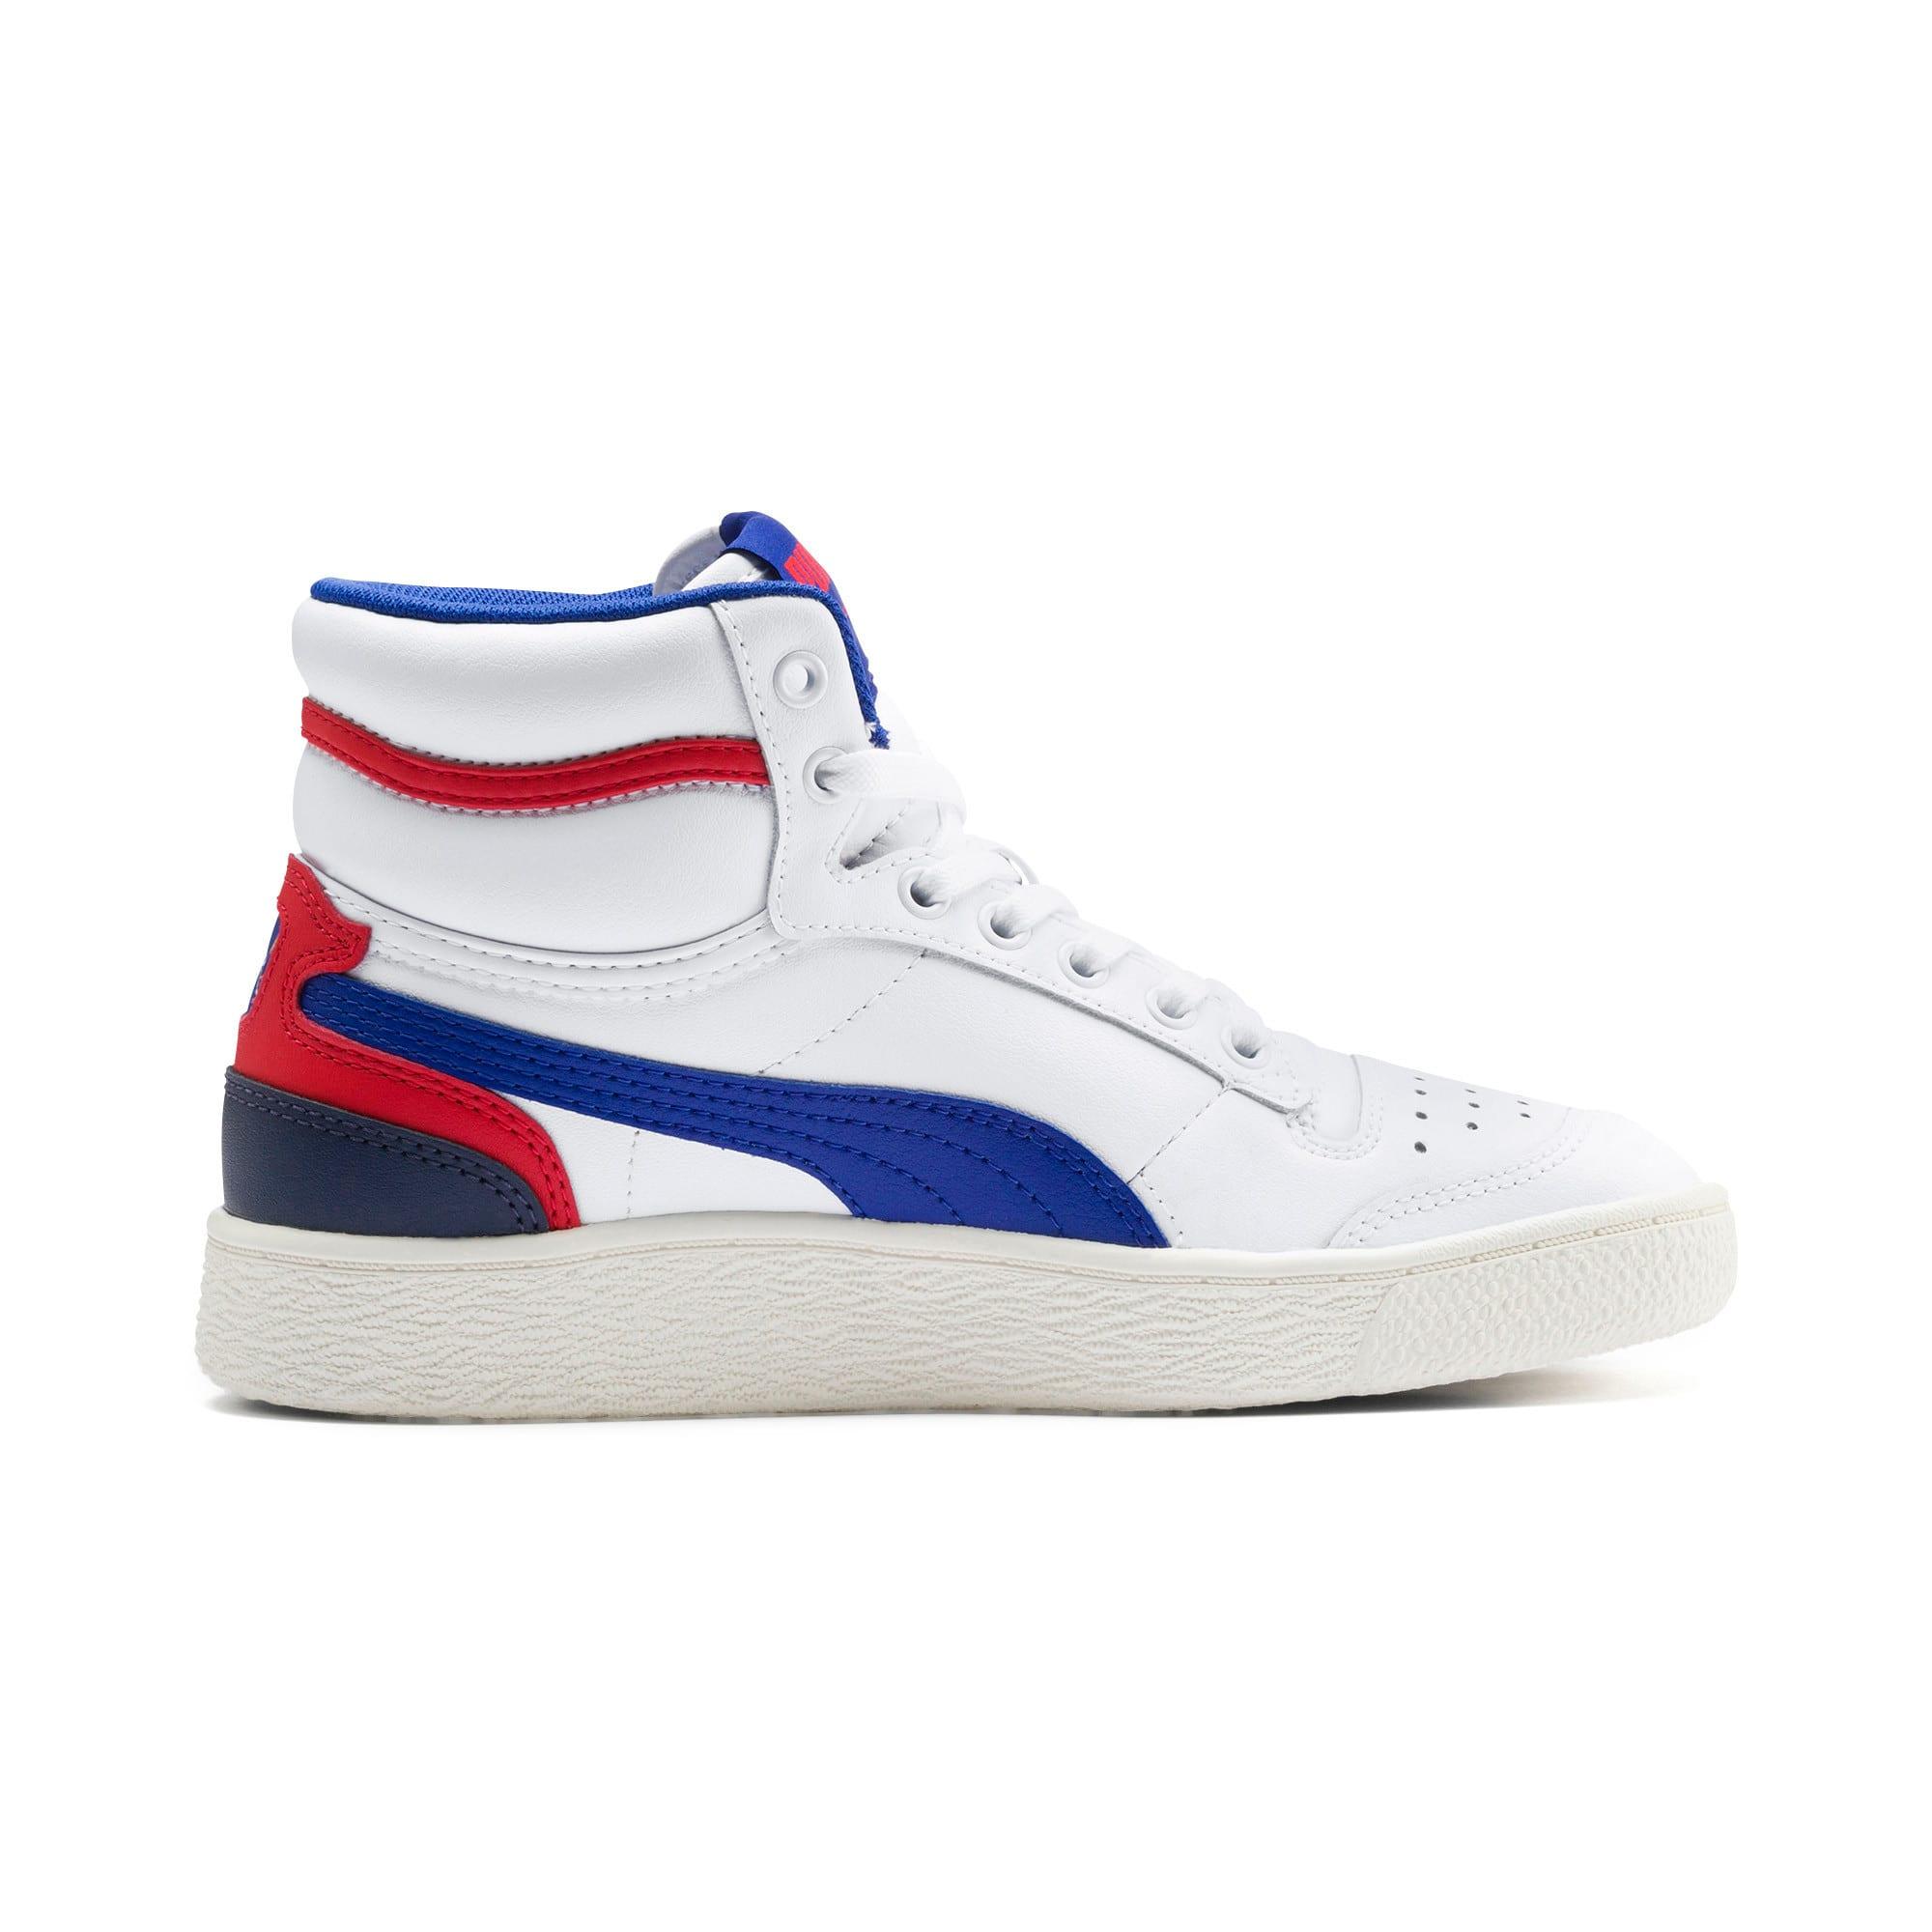 Thumbnail 5 of Ralph Sampson Mid Sneakers JR, White-SurfTheWeb-Marshmallow, medium